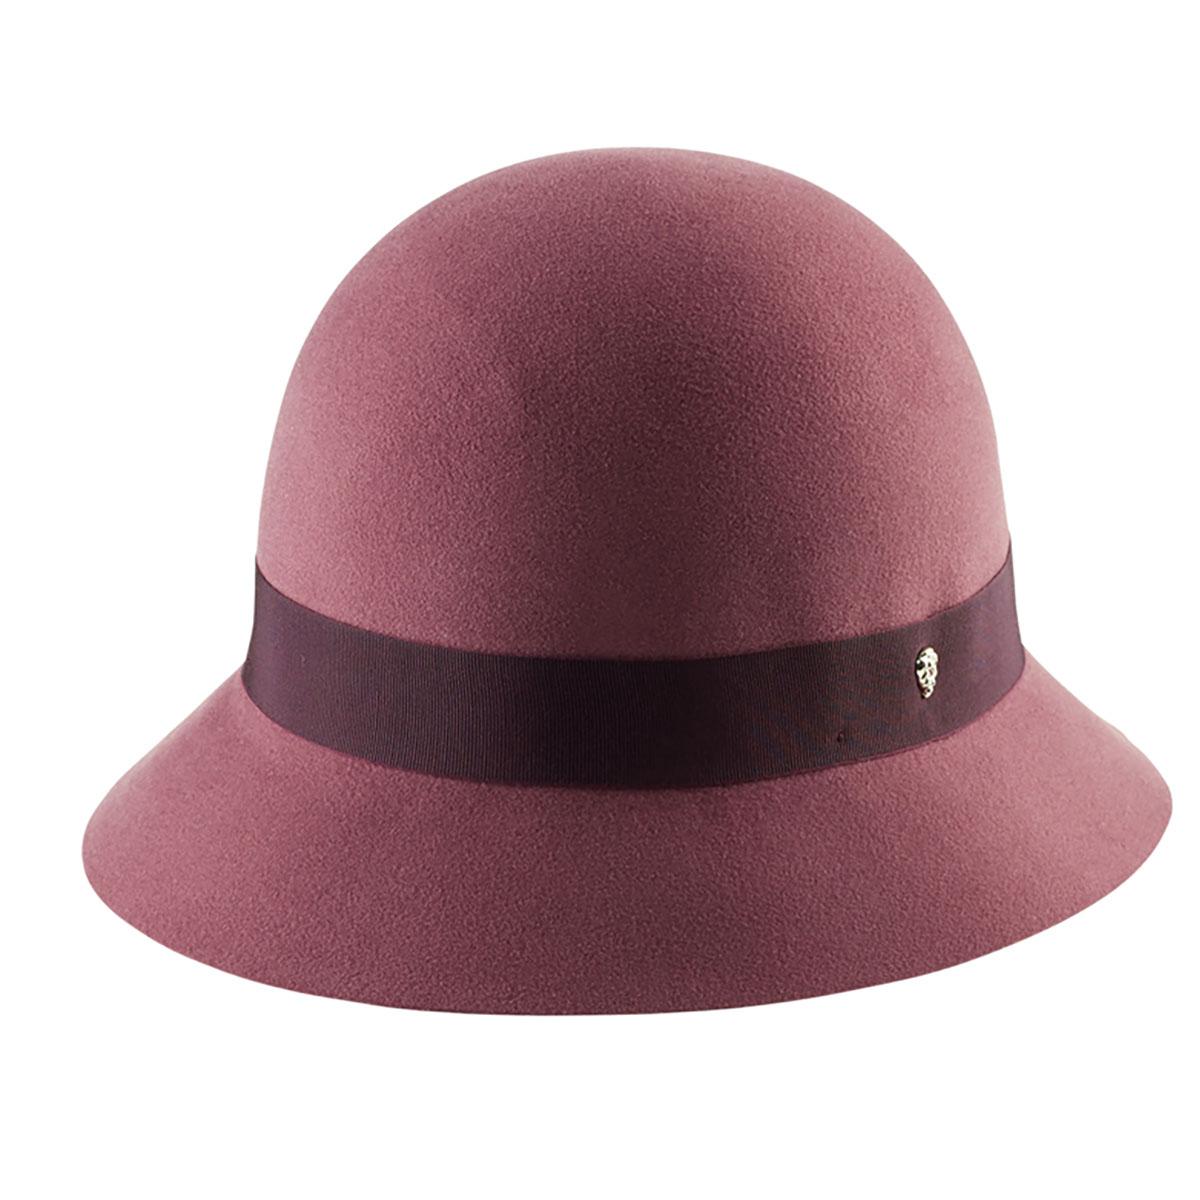 Women's Vintage Hats | Old Fashioned Hats | Retro Hats Etta Cloche $310.00 AT vintagedancer.com